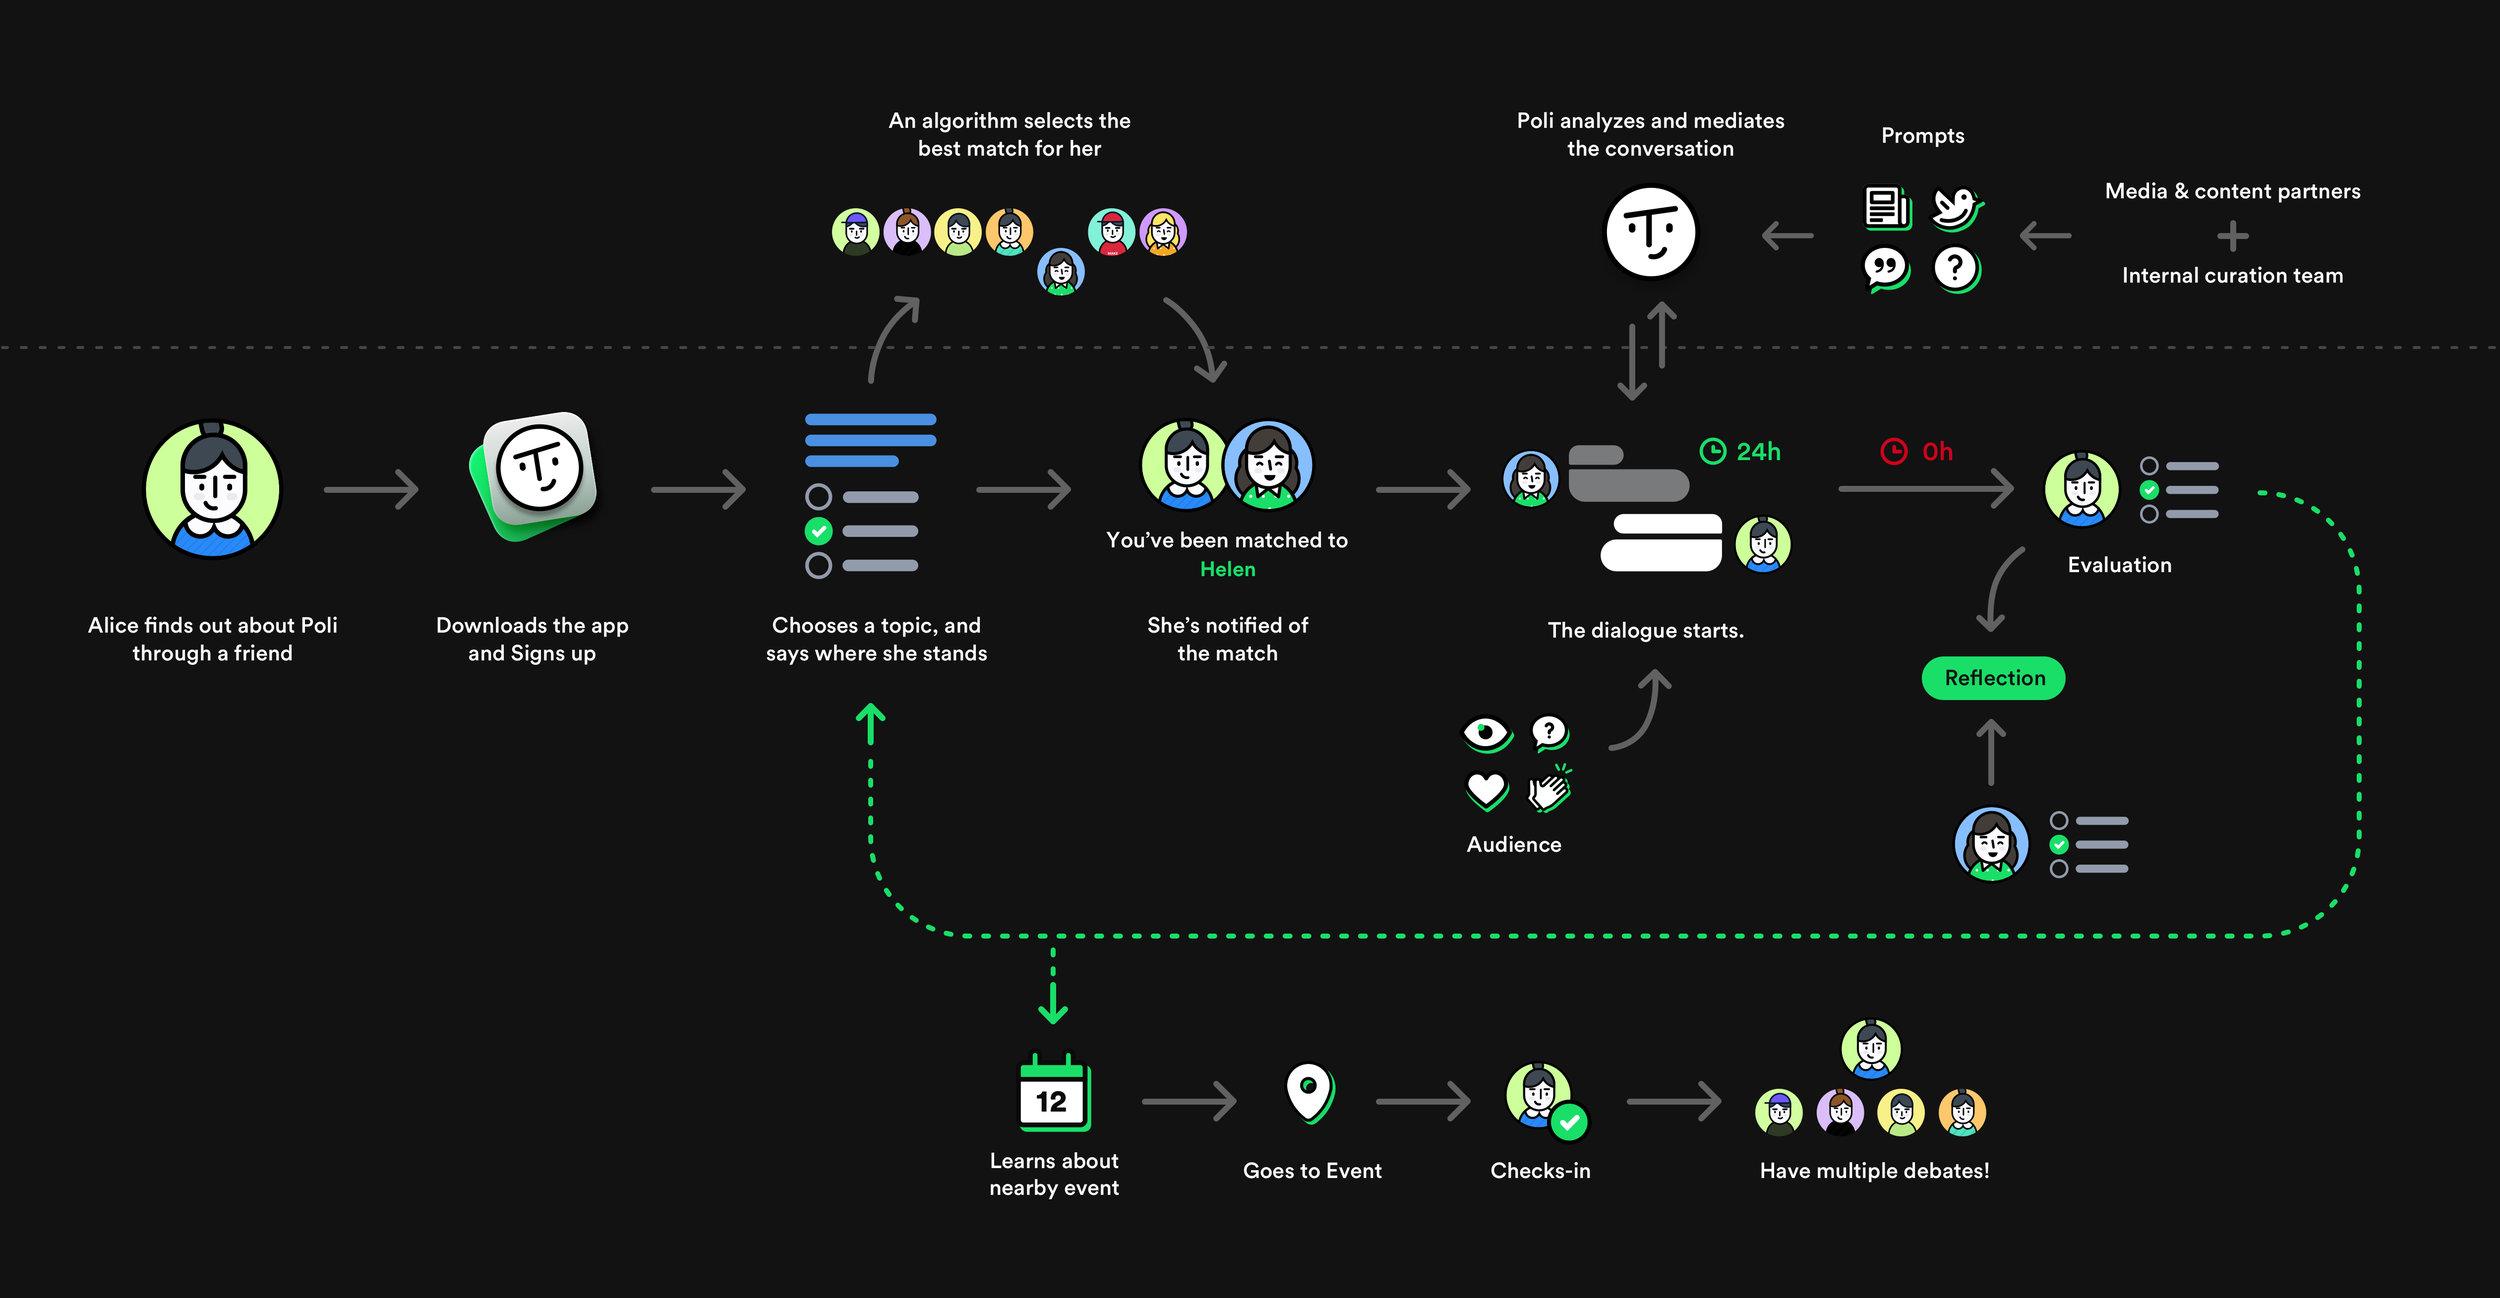 Service Overview@2x.jpg